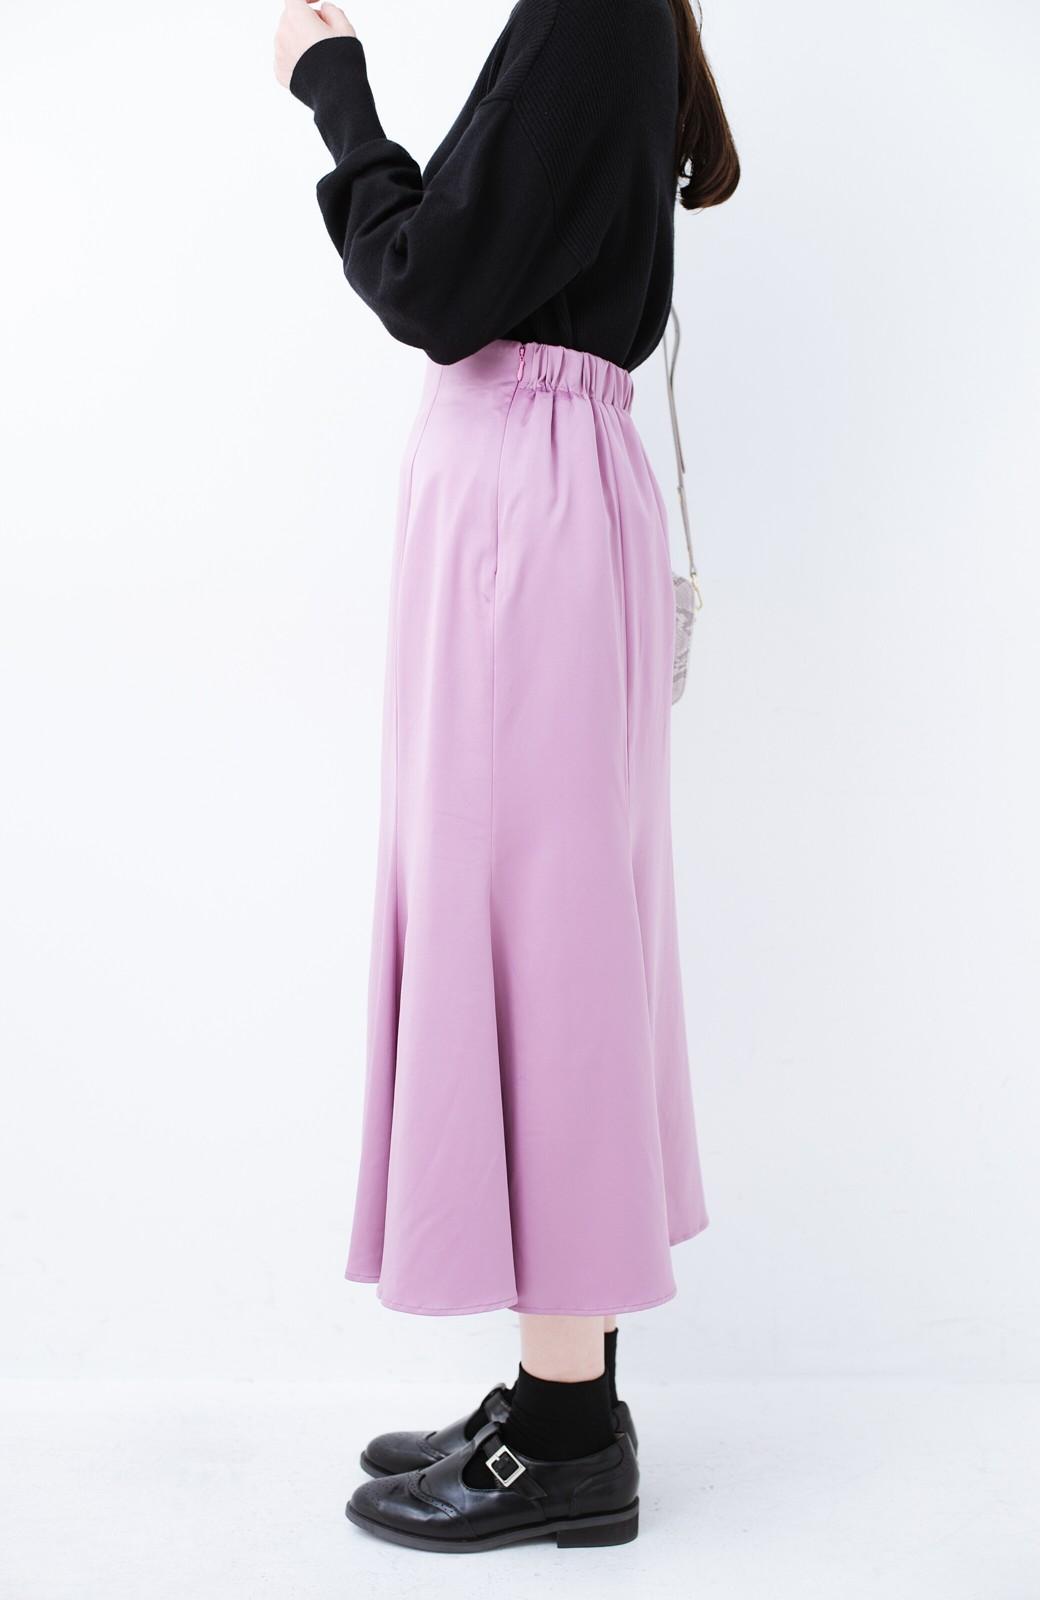 haco! スウェットやスニーカーを合わせても女っぽくいられるサテンマーメイドスカート by que made me <ピンク>の商品写真12